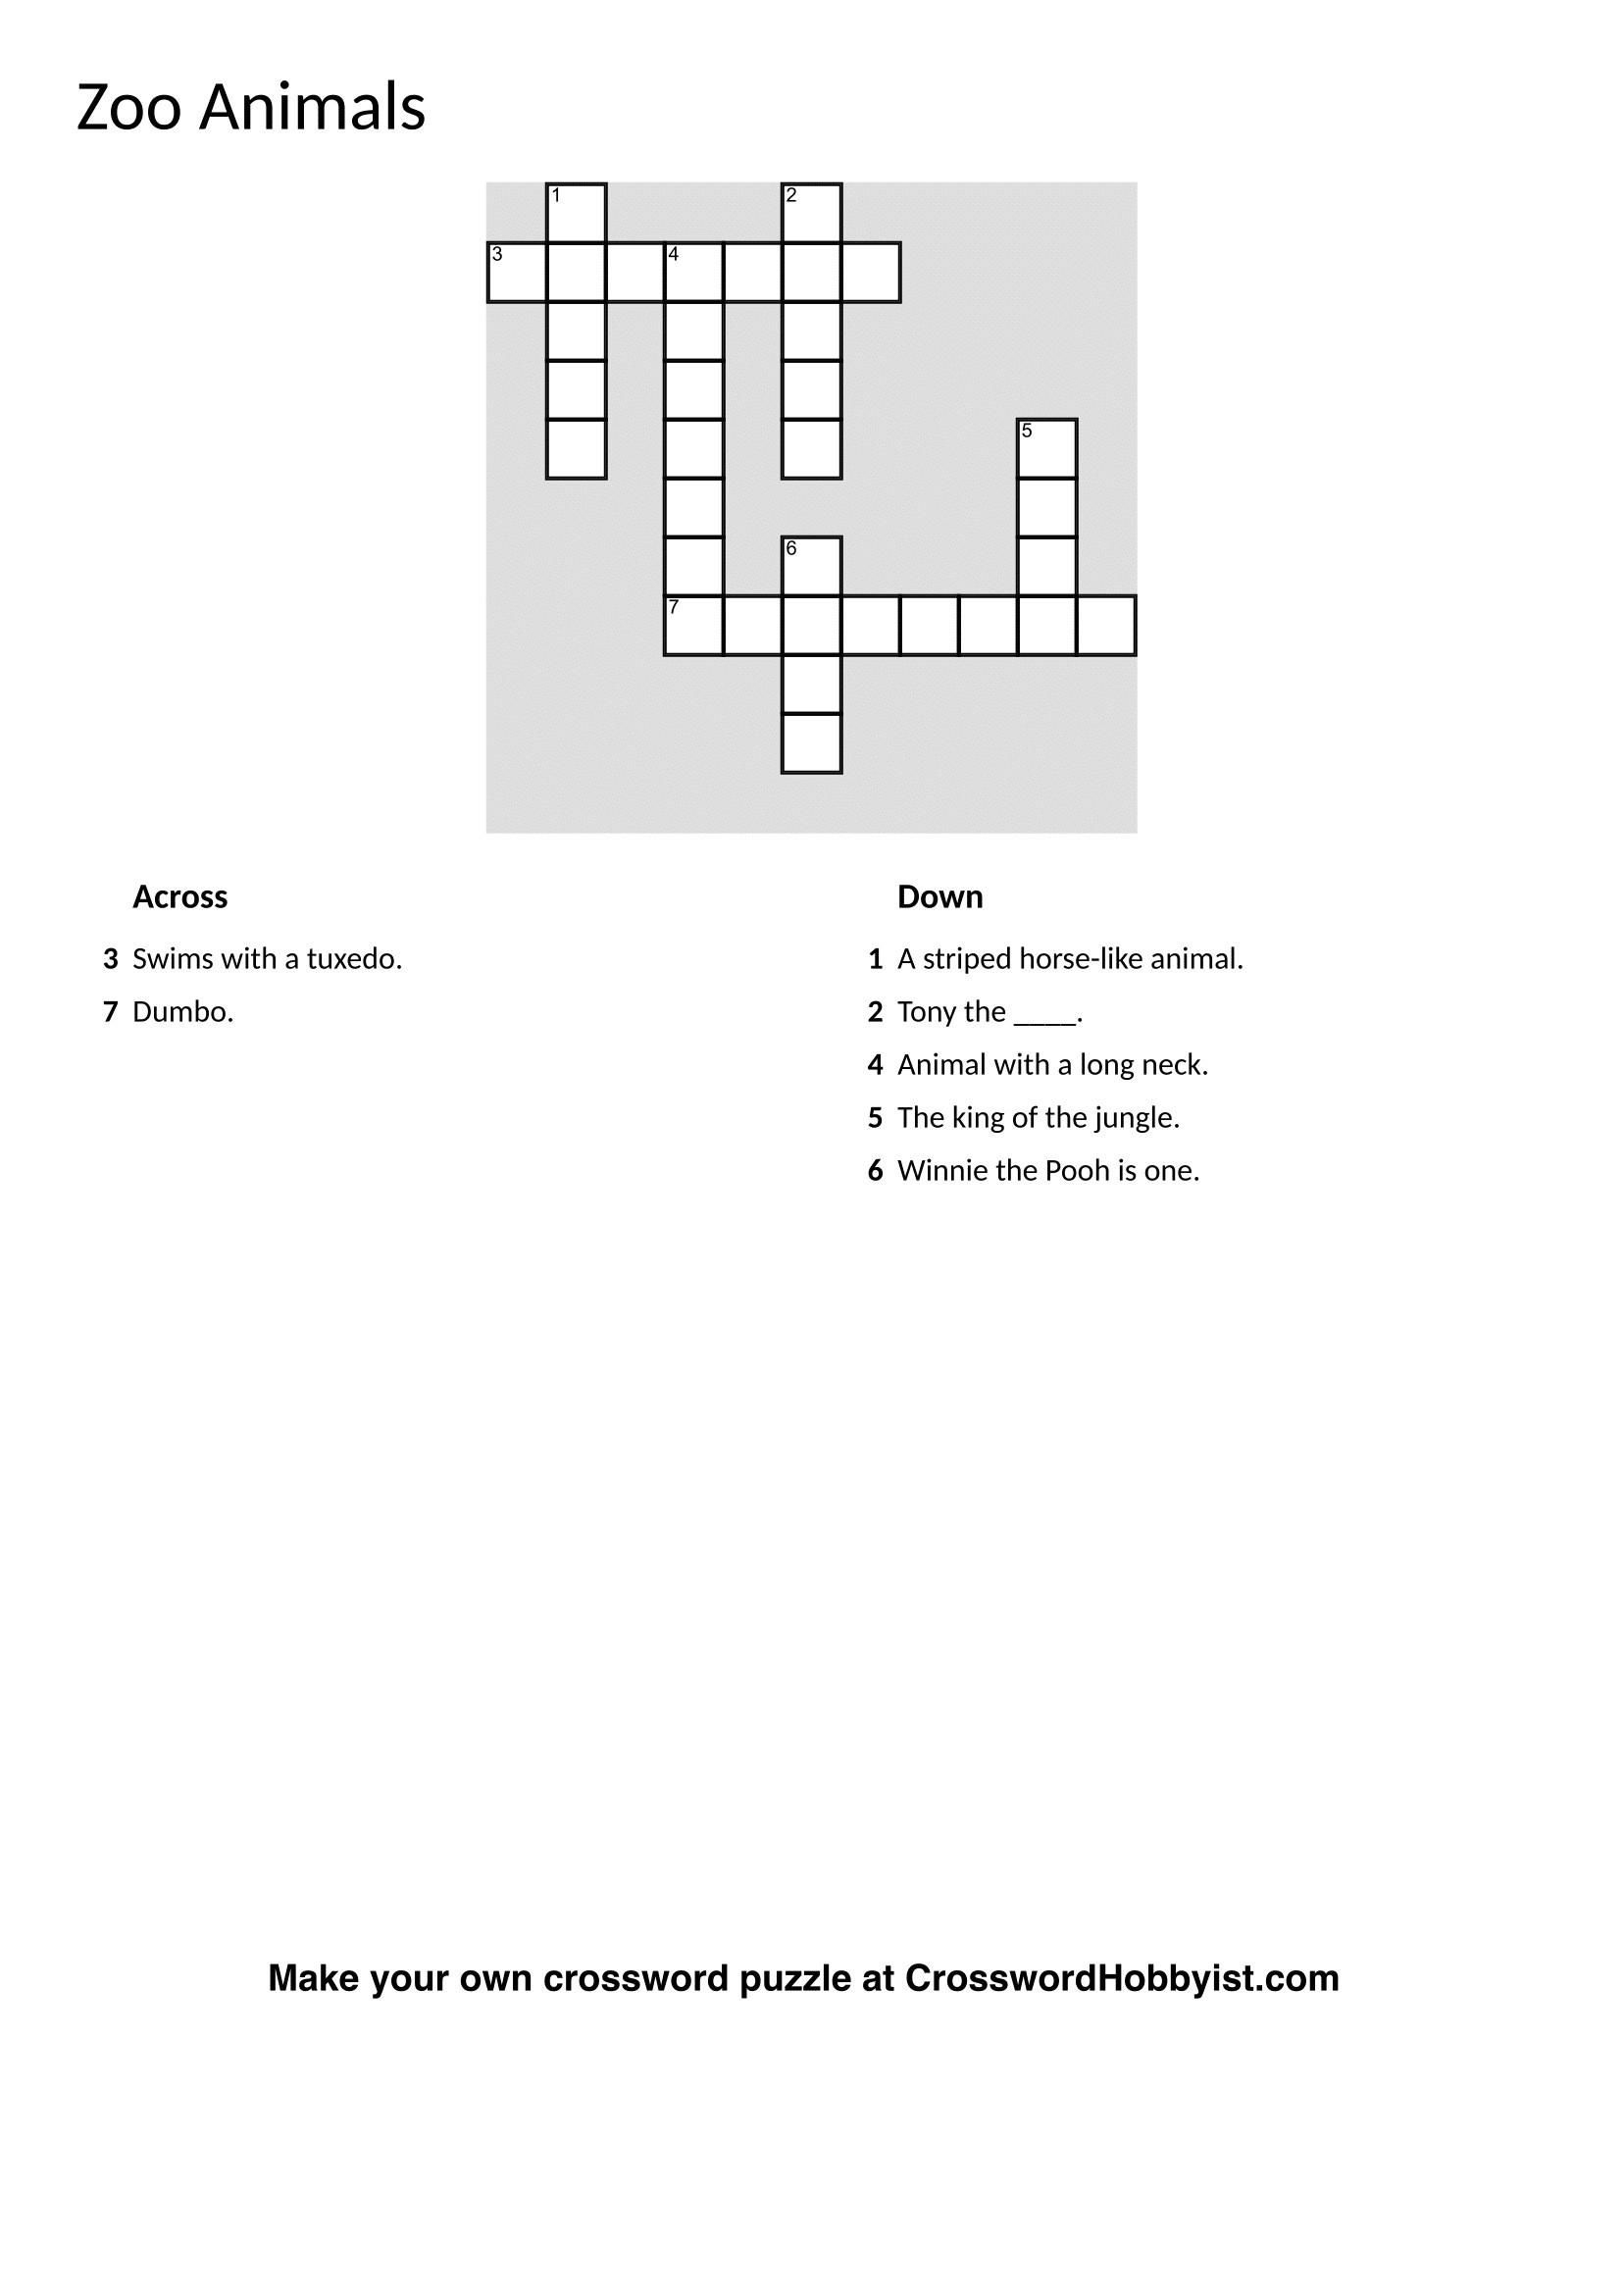 Crossword Puzzle Maker Online Free Printable Crosswords Jigsaw - Jigsaw Puzzle Maker Free Printable